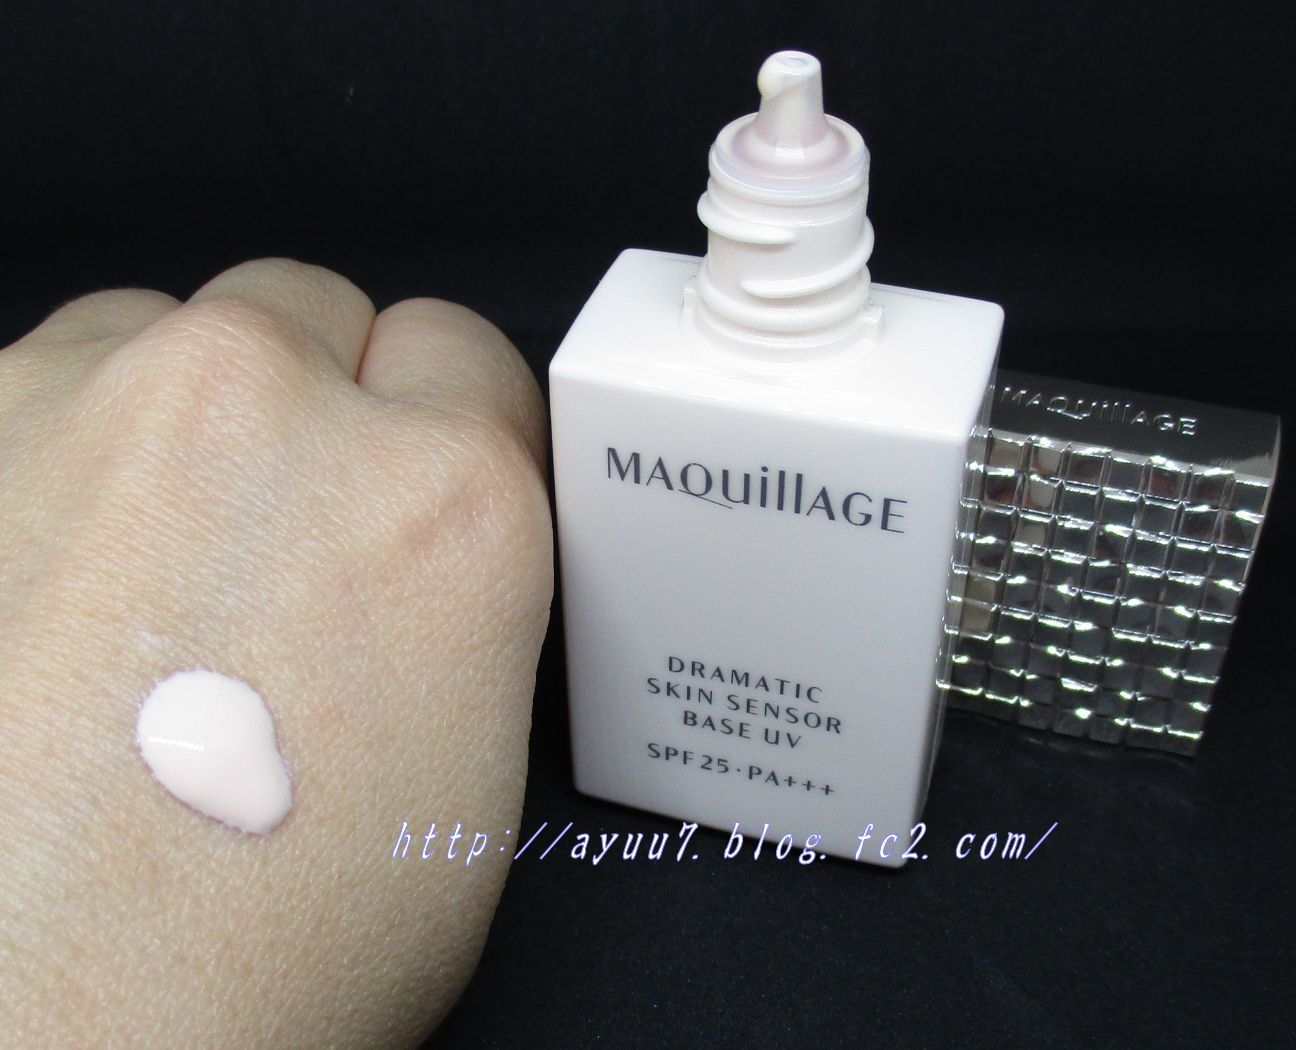 maquillbase3.jpg